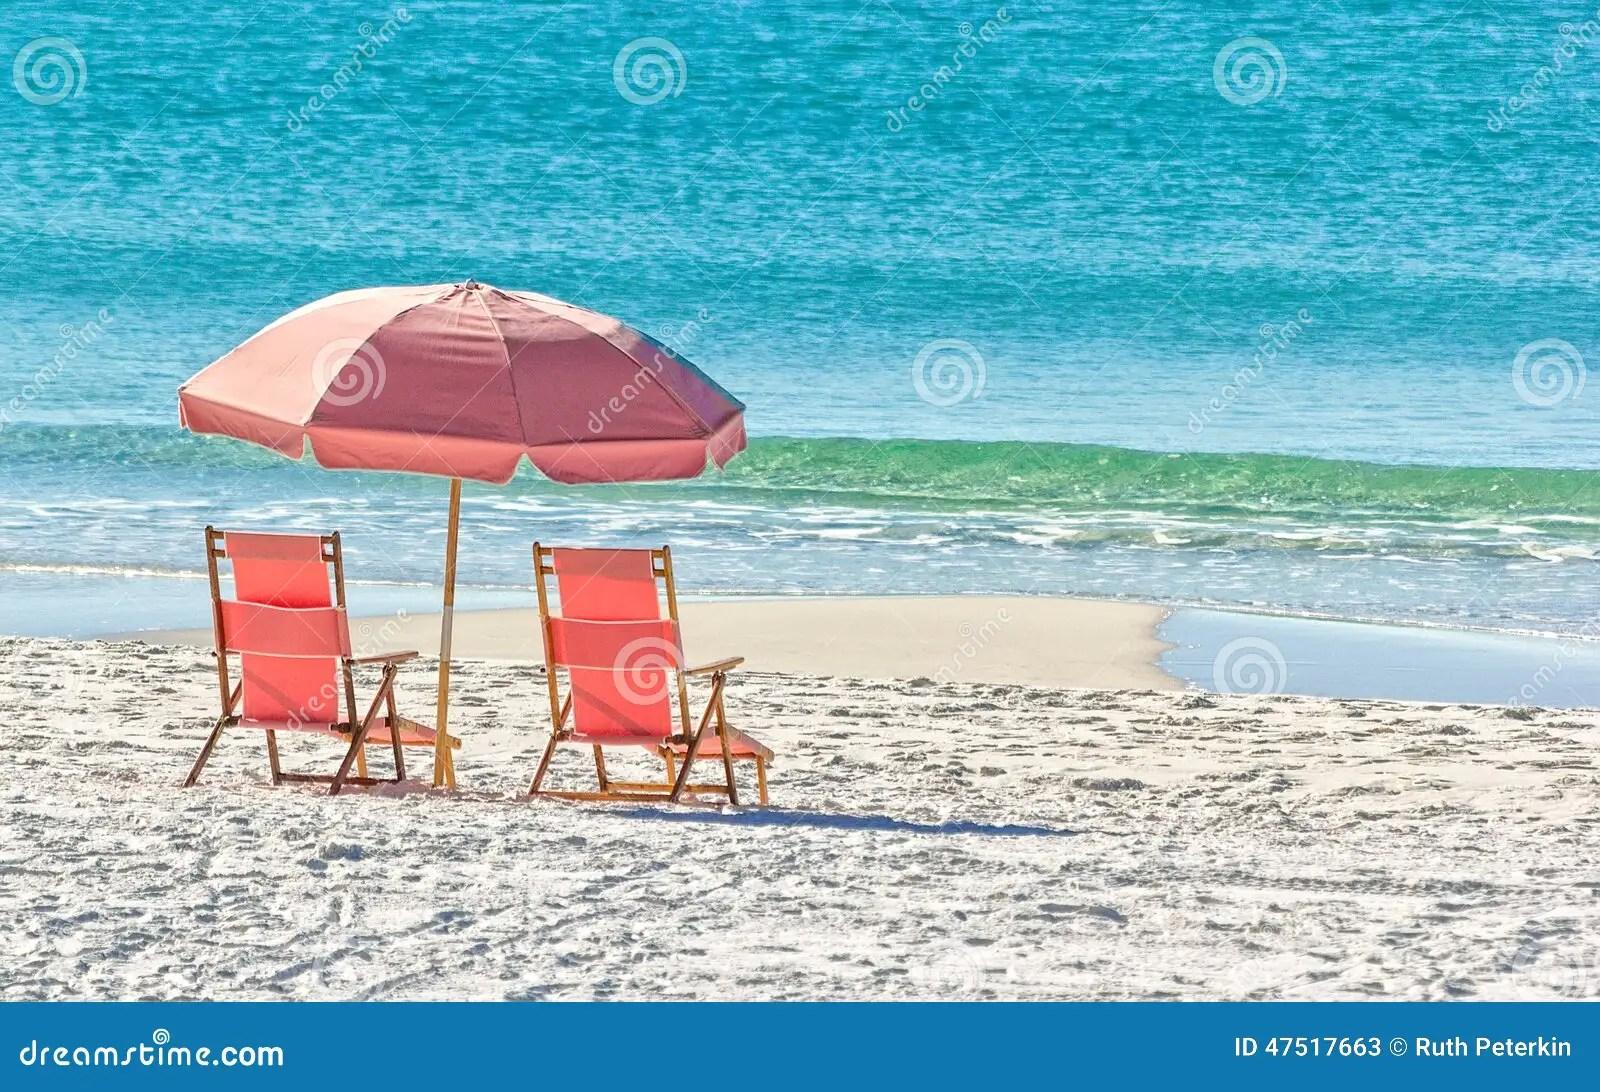 pink beach chair swivel nz destin florida stock image of closeup seagrass